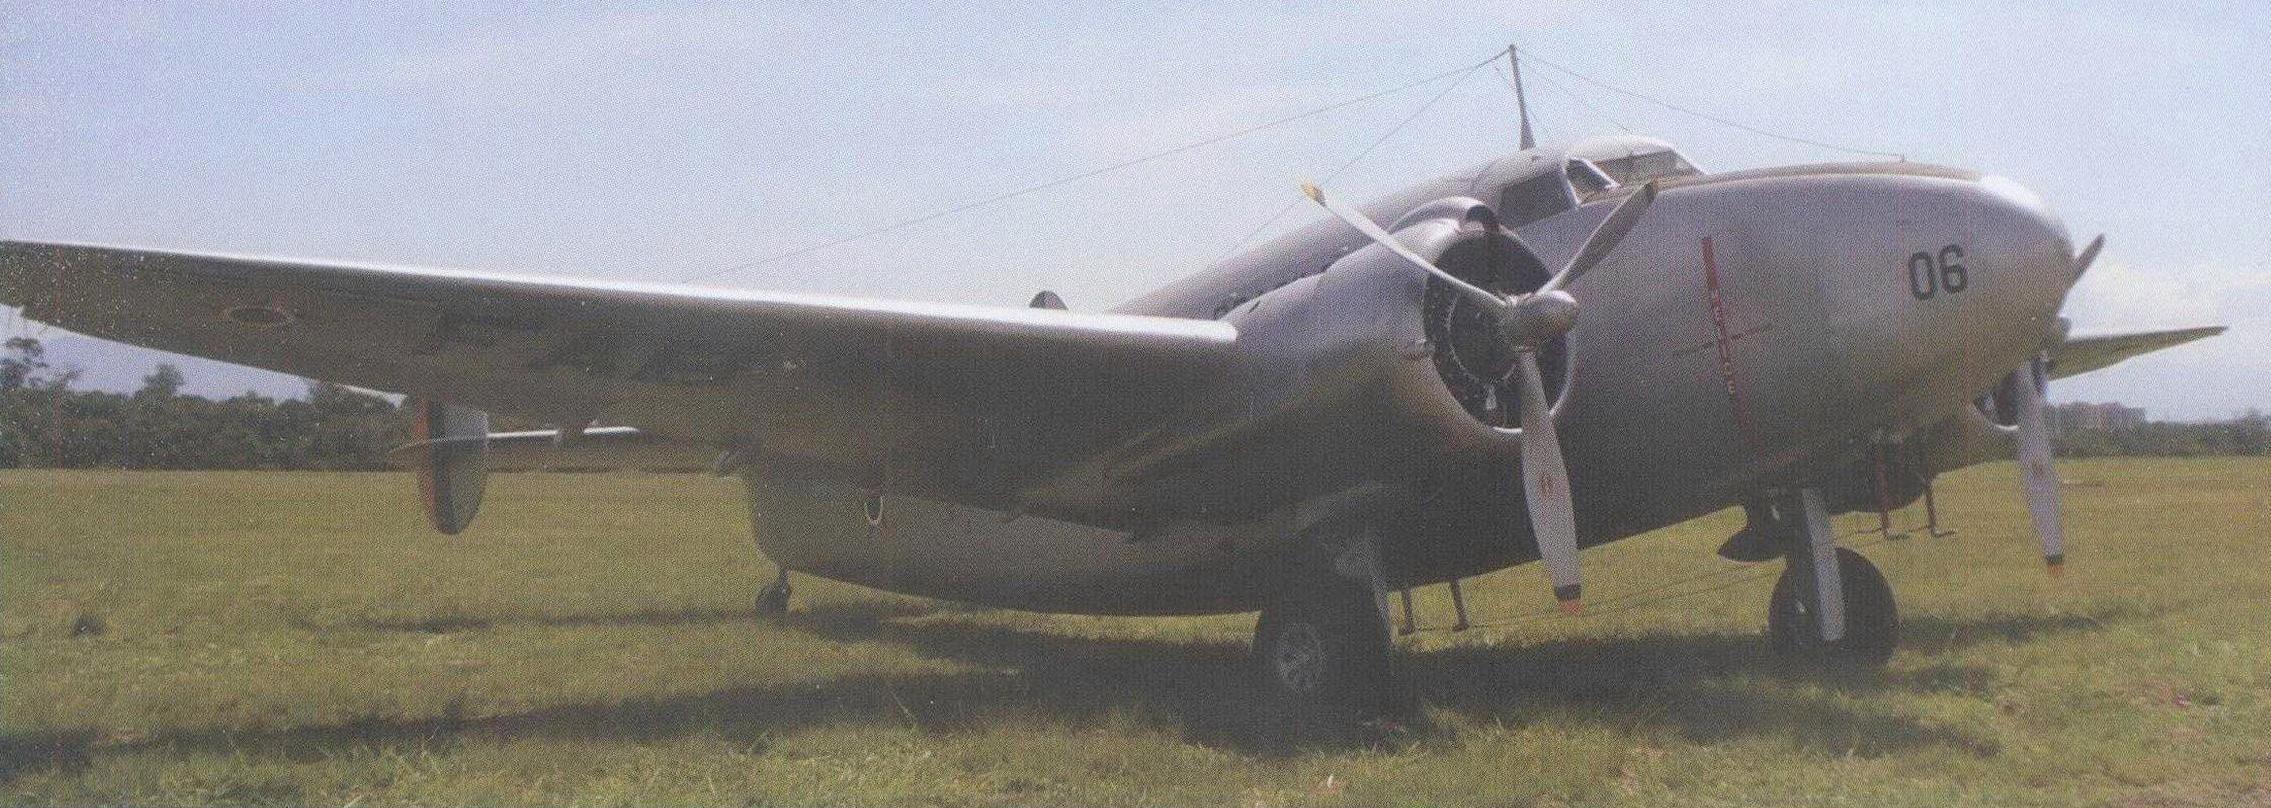 Транспортный самолет С-60А «Лоудстар»